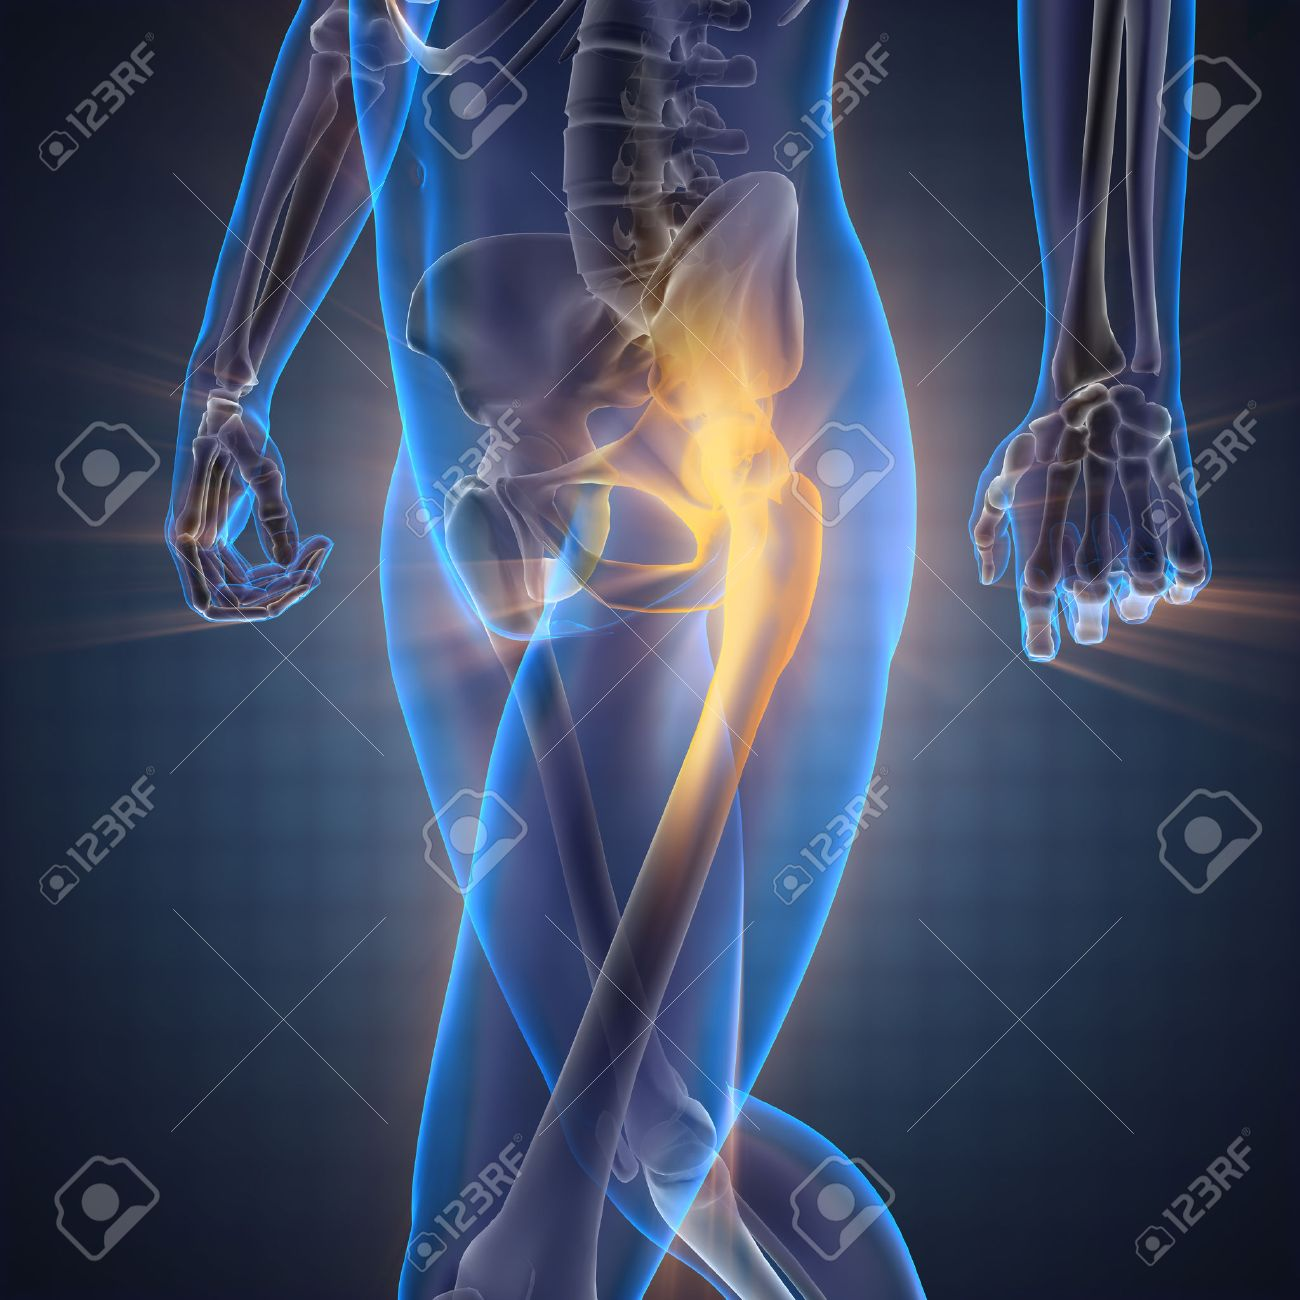 human bones radiography scan image - 47536331